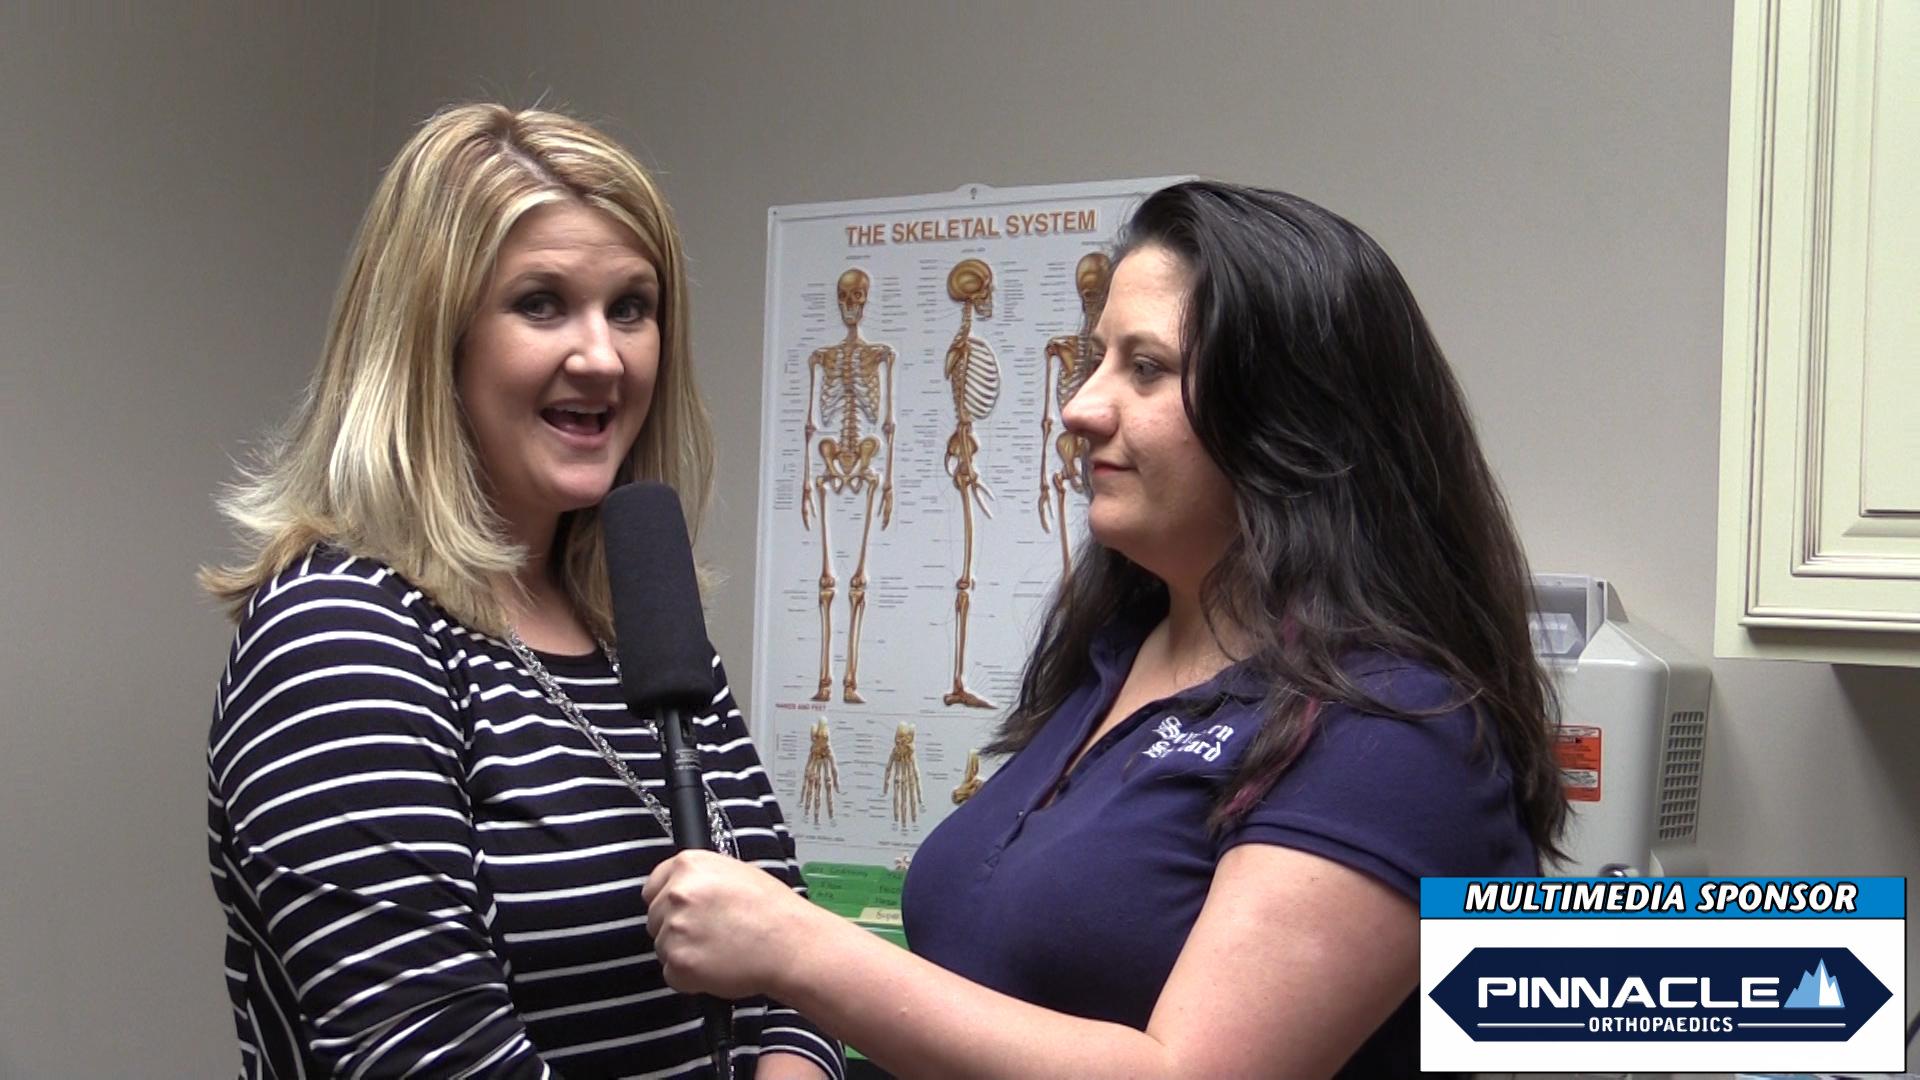 VIDEO: Hailey Taylor joins Pinnacle Orthopaedics